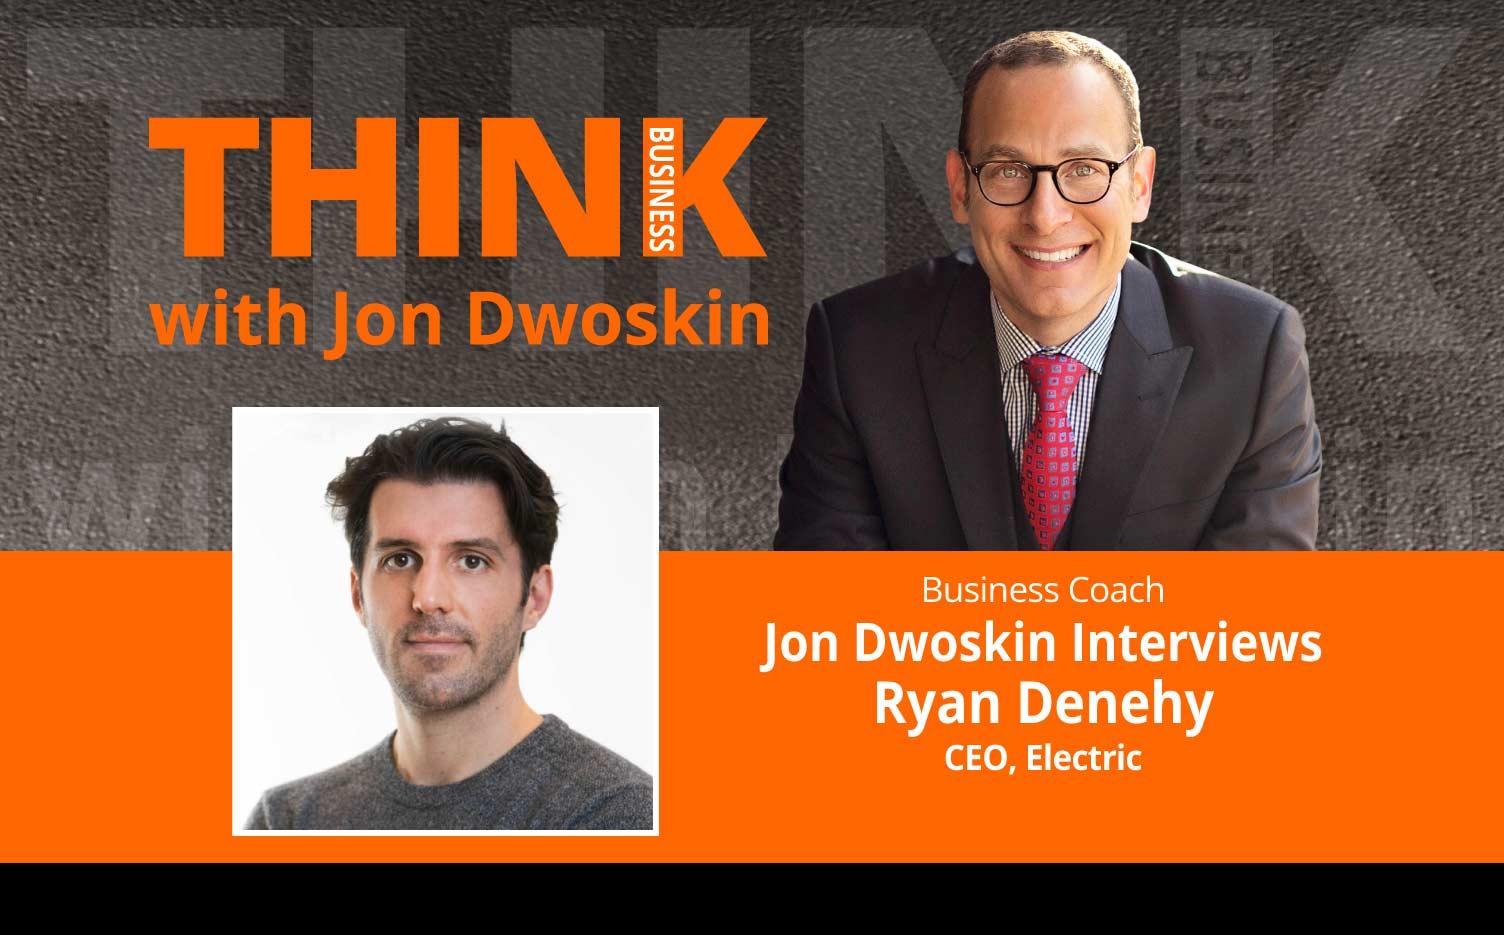 THINK Business Podcast: Jon Dwoskin Interviews Ryan Denehy, CEO, Electric